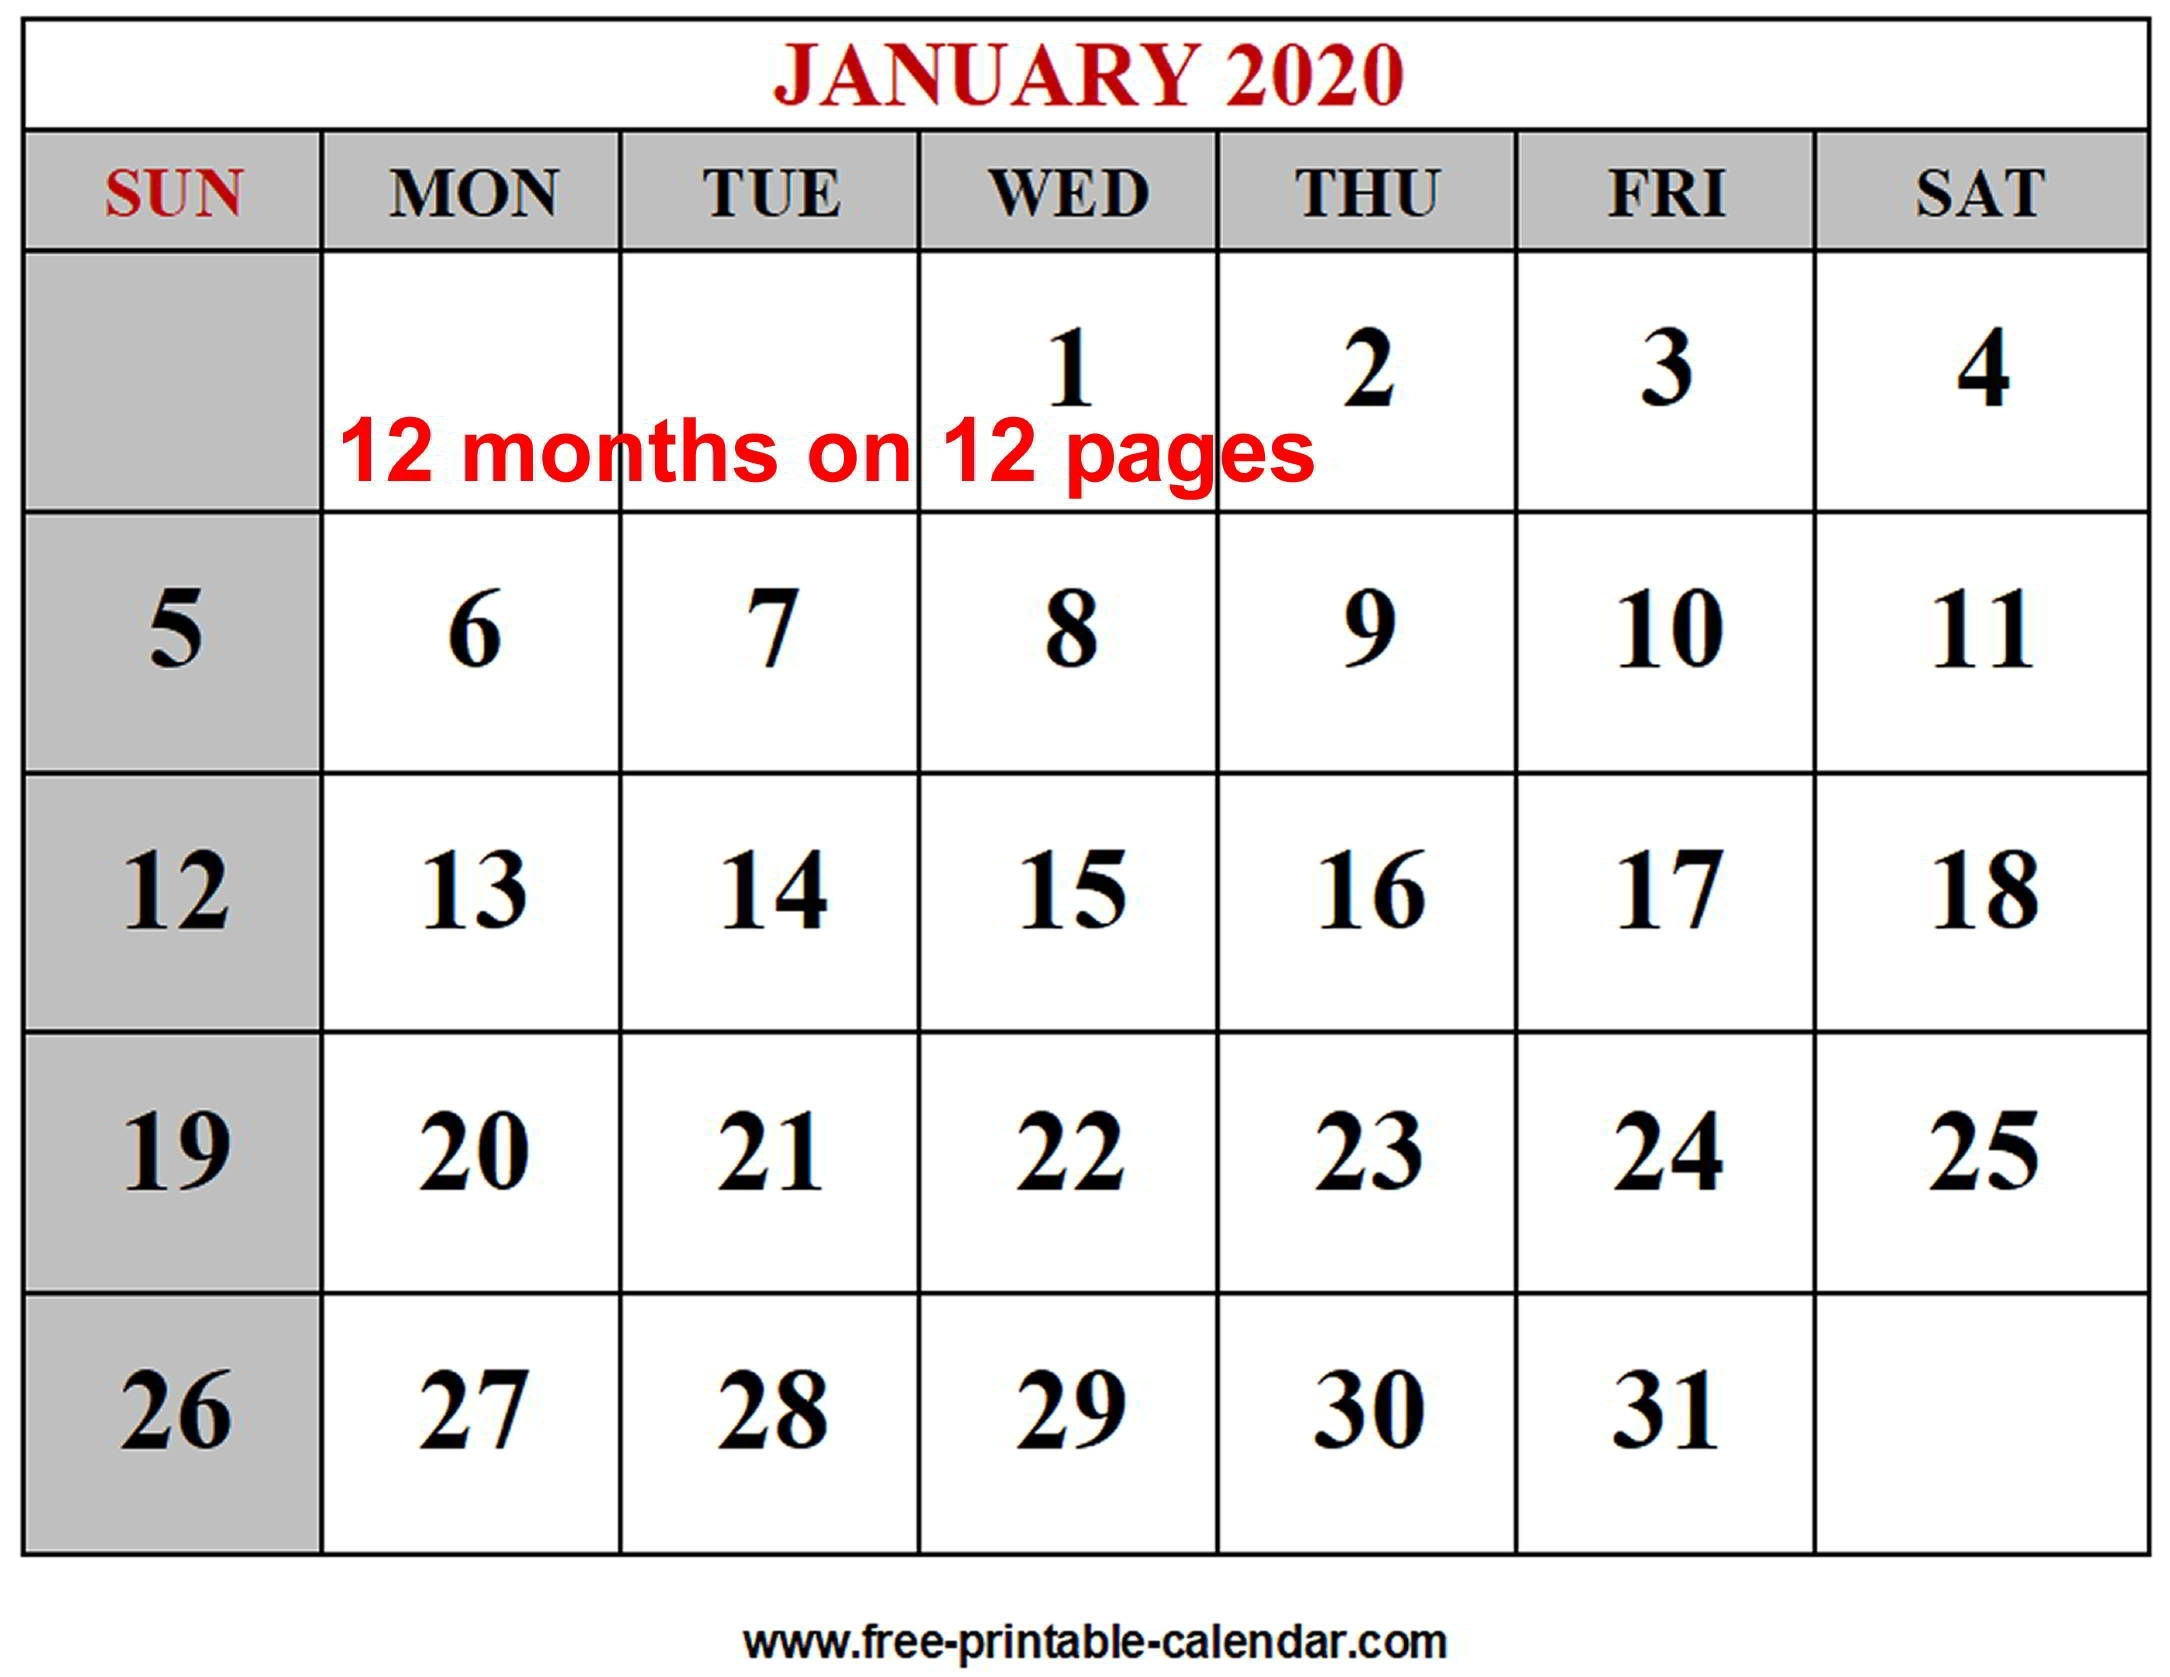 Year 2020 Calendar Templates - Free-Printable-Calendar in 2020 Free Monthly Printable Calendars